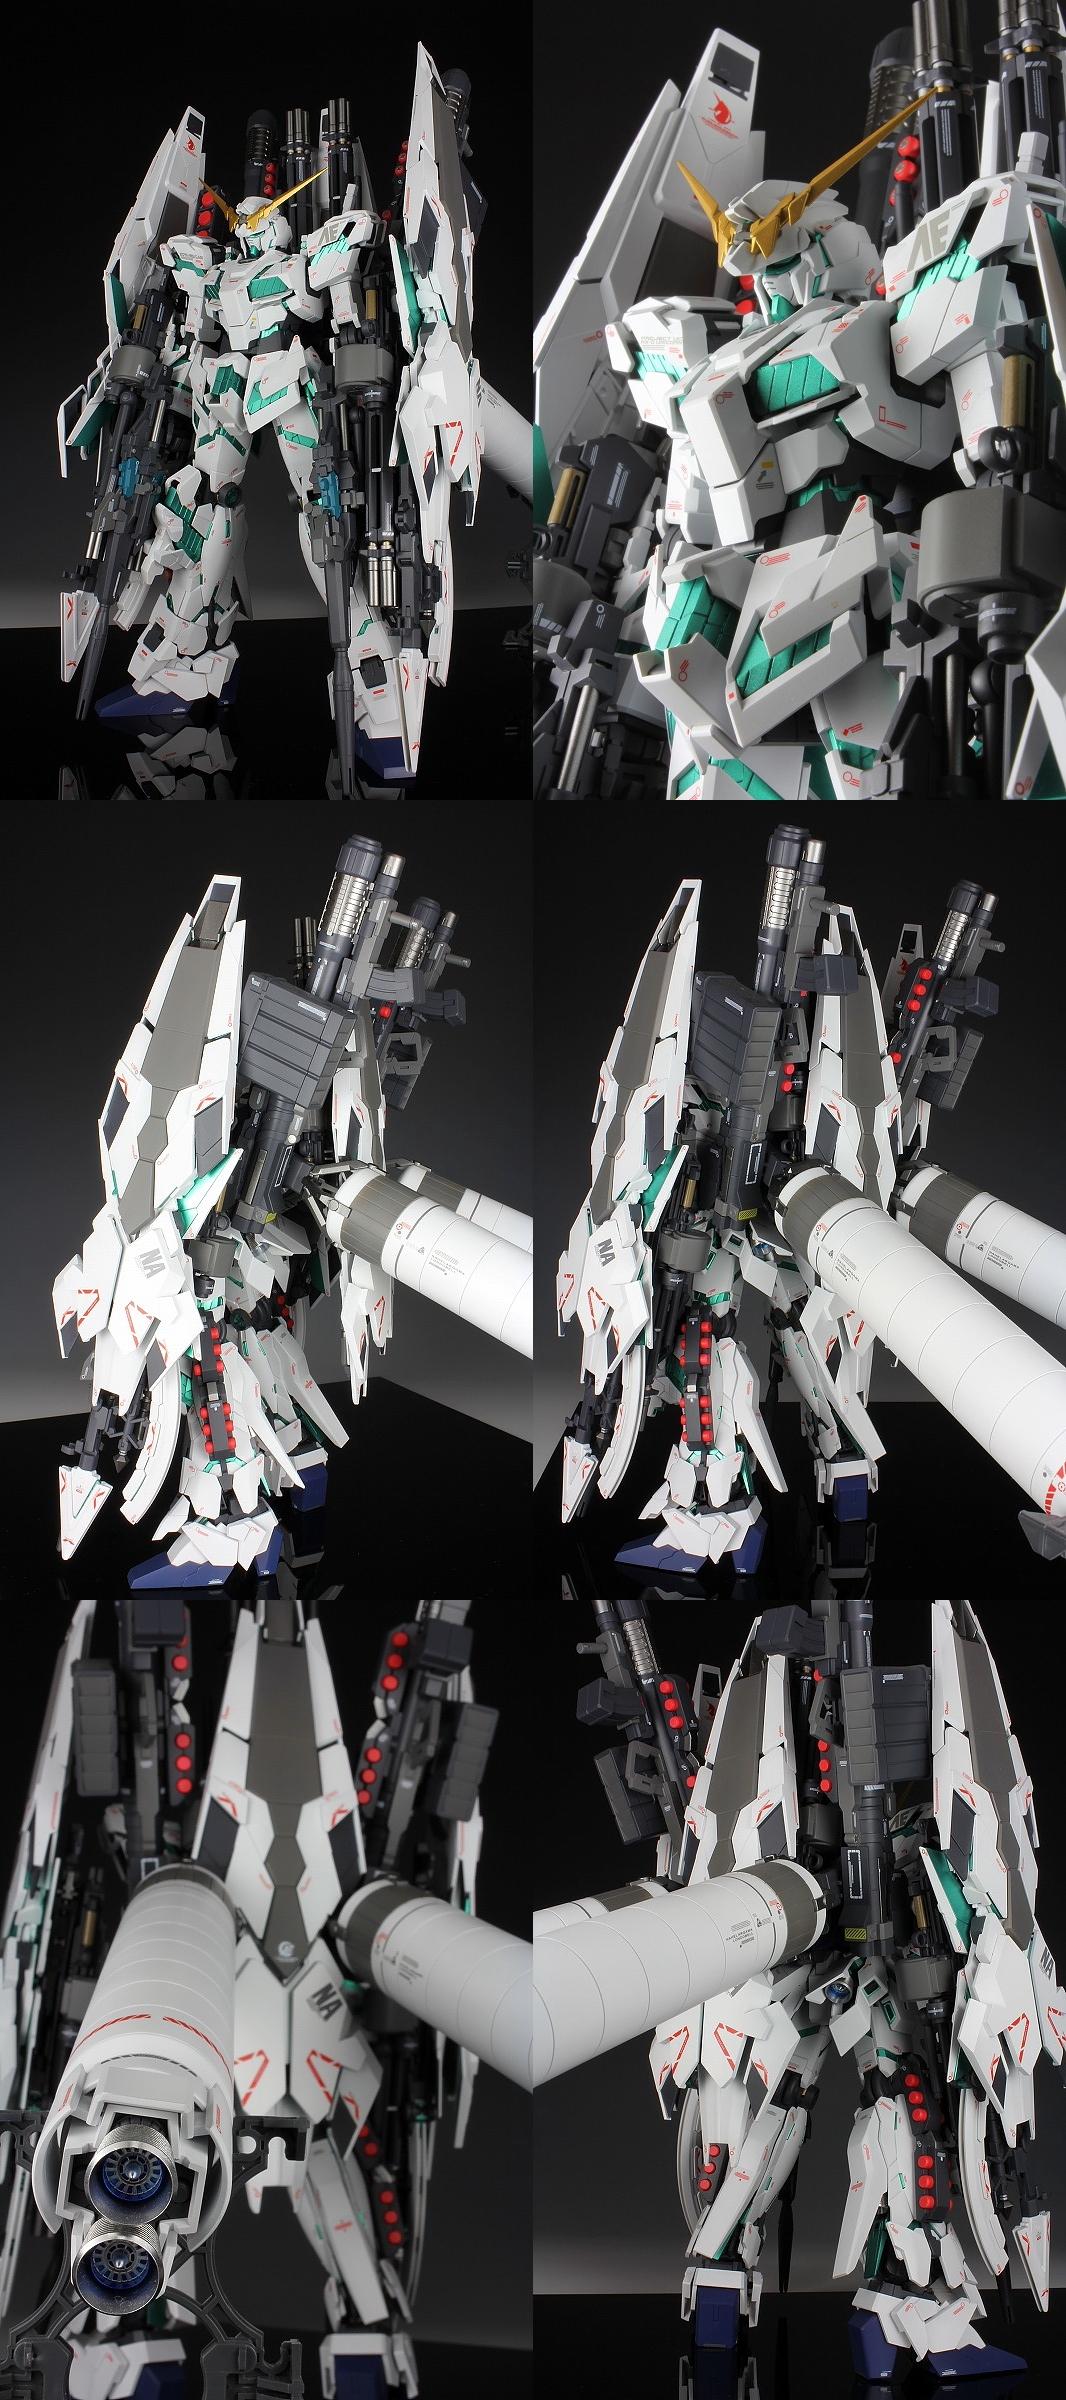 MGRX0-22.jpg